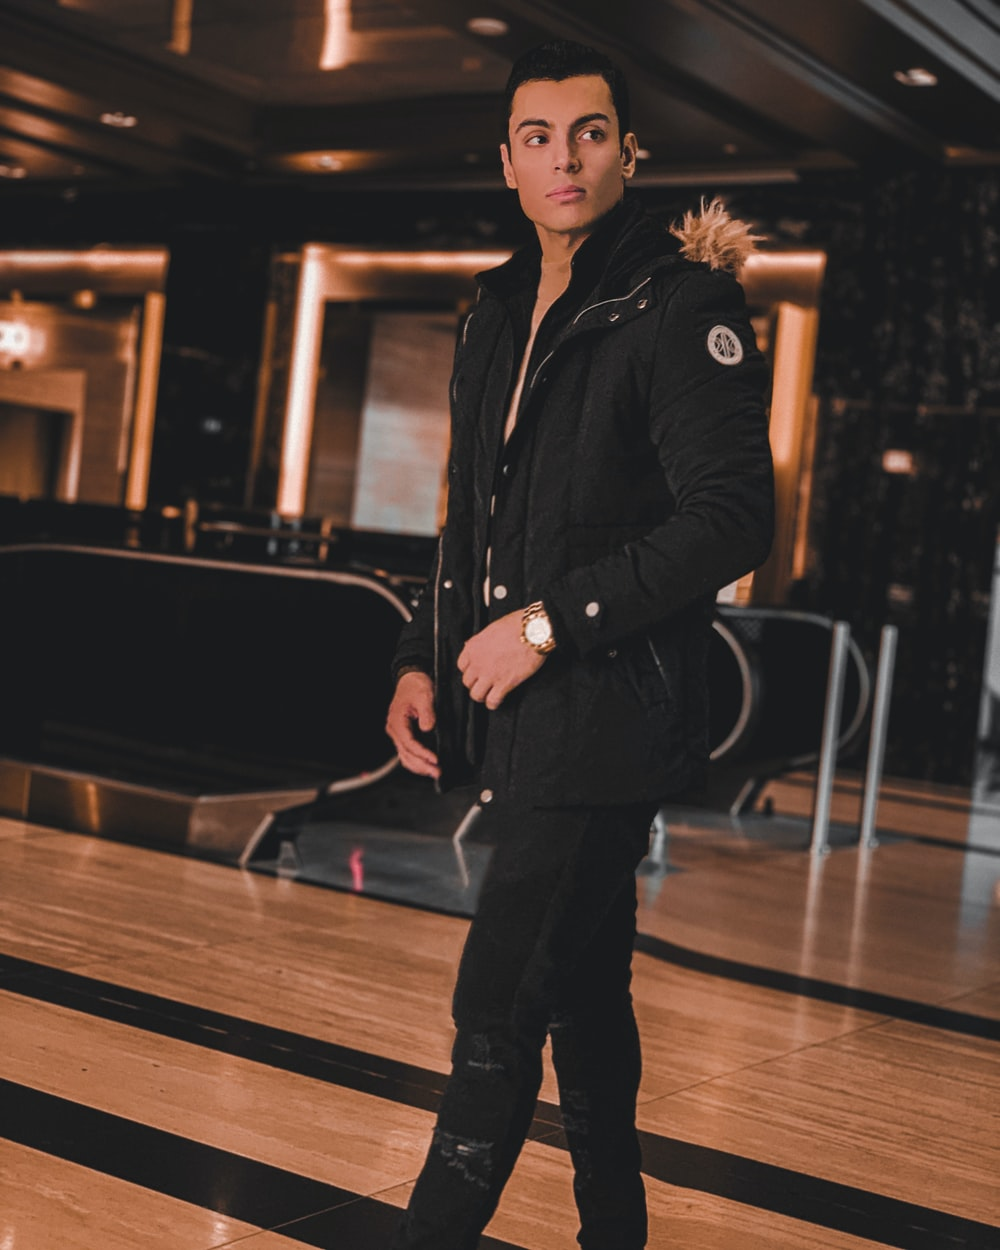 woman in black coat and black pants standing on brown wooden floor